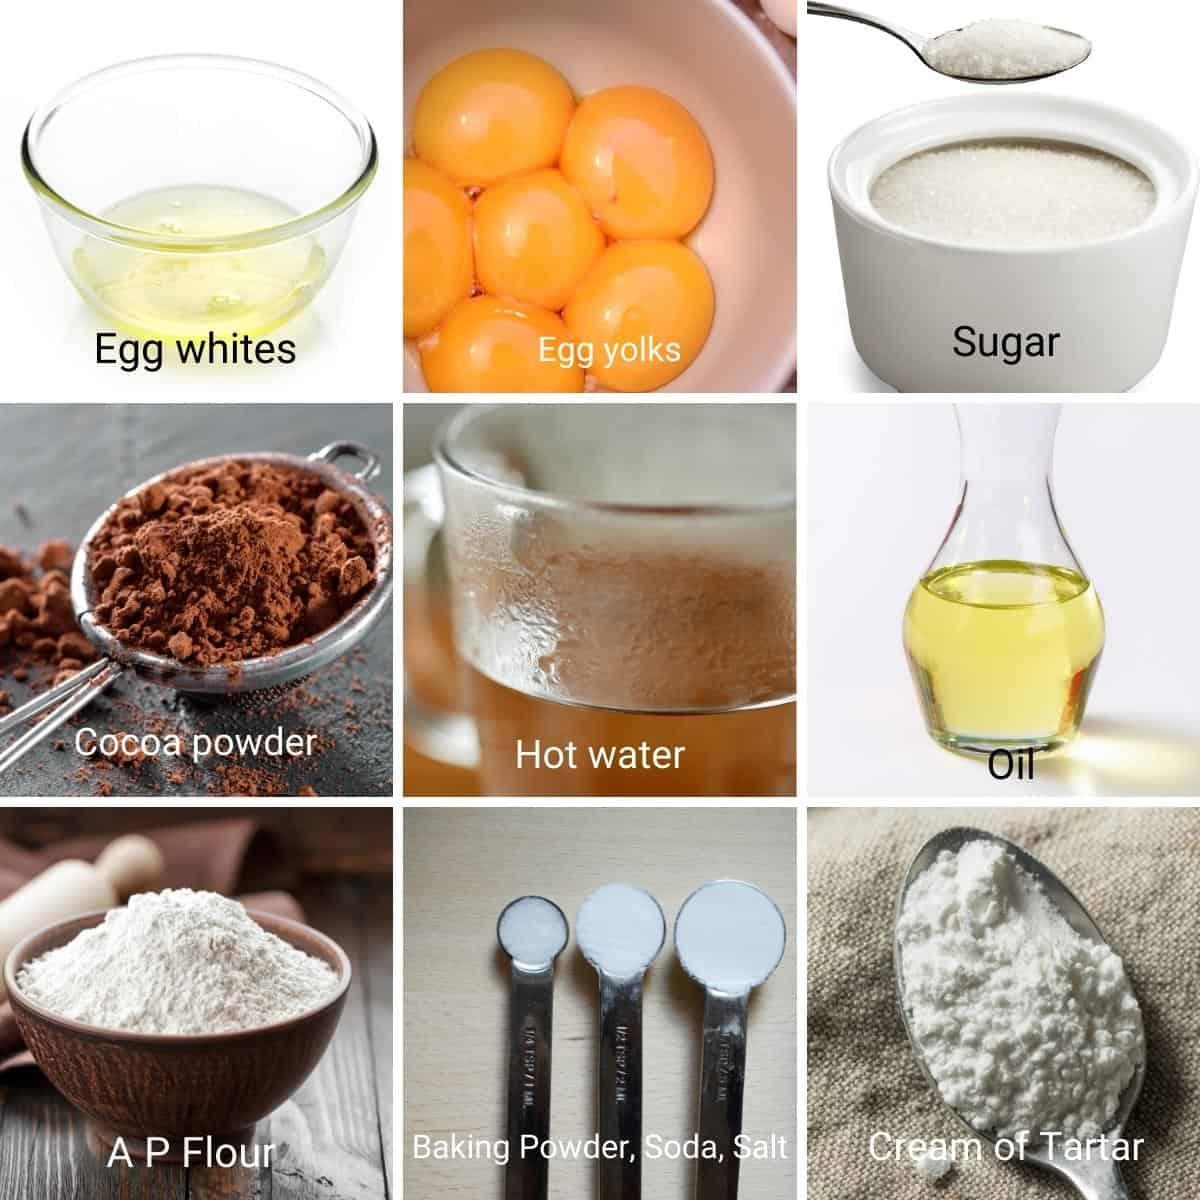 Ingredients shot collage for chiffon cake.